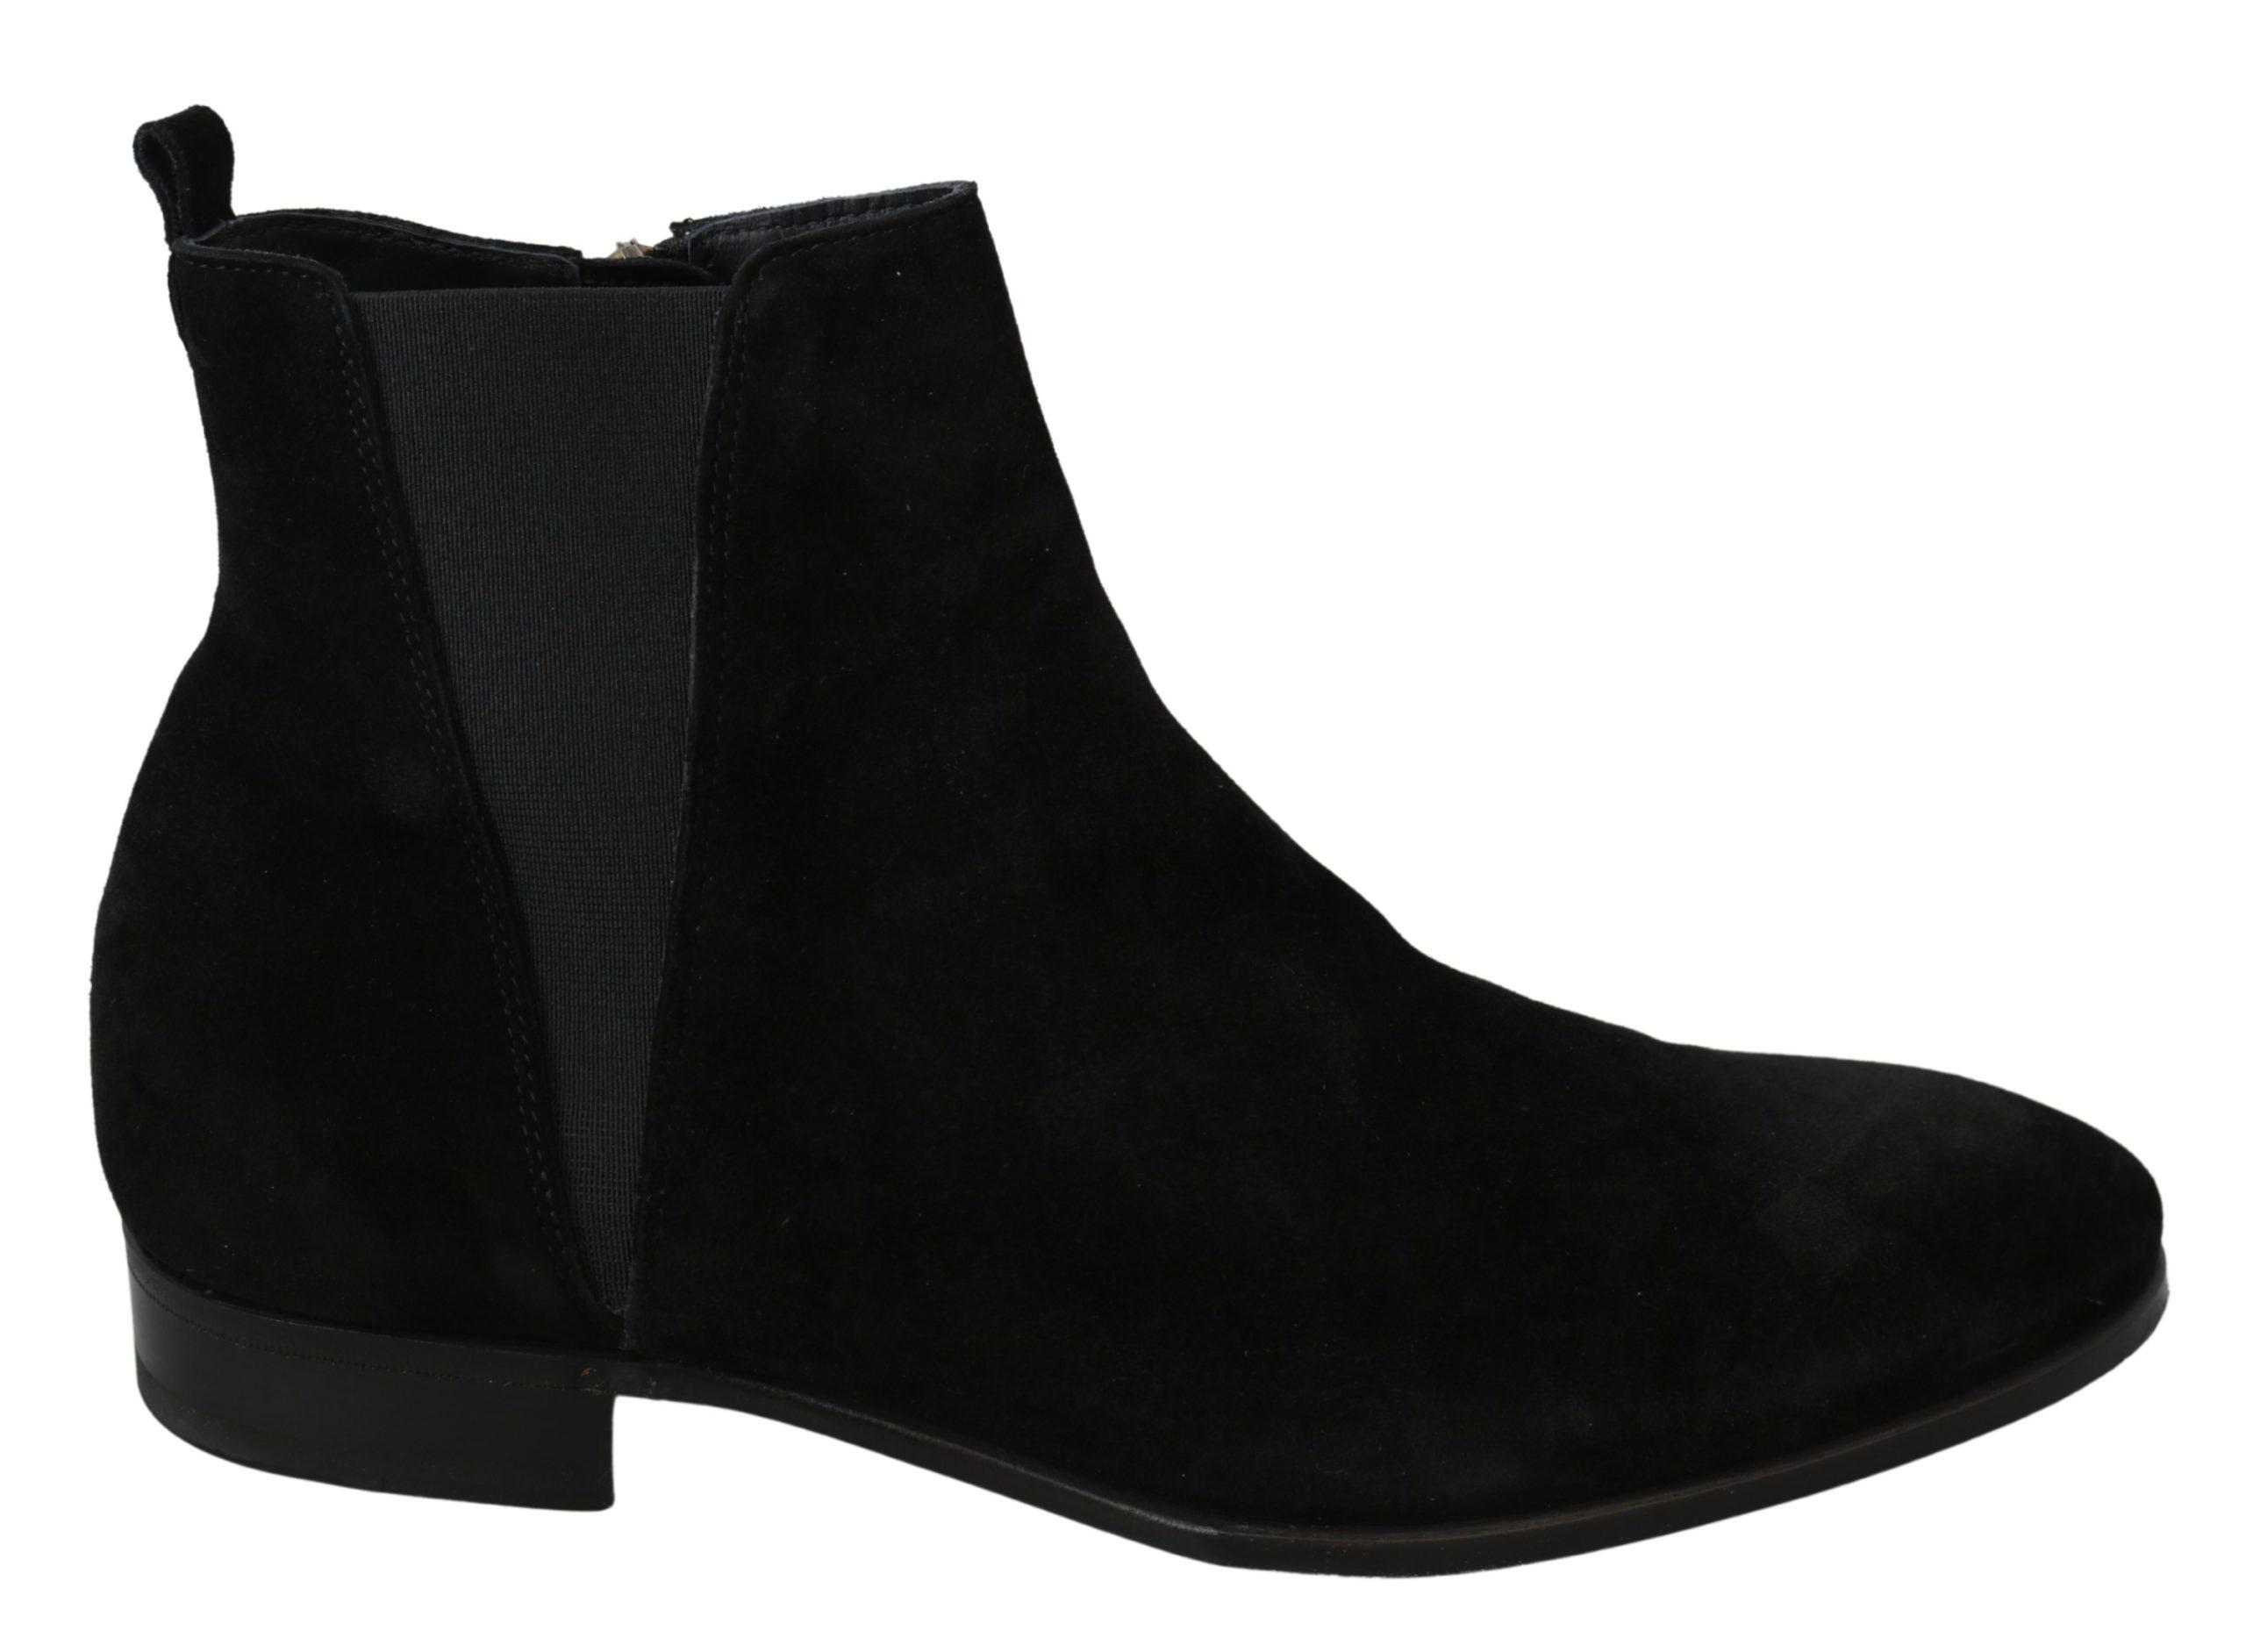 Dolce & Gabbana Men's Suede Leather Chelsea Boot Black MV2895 - EU42/US9